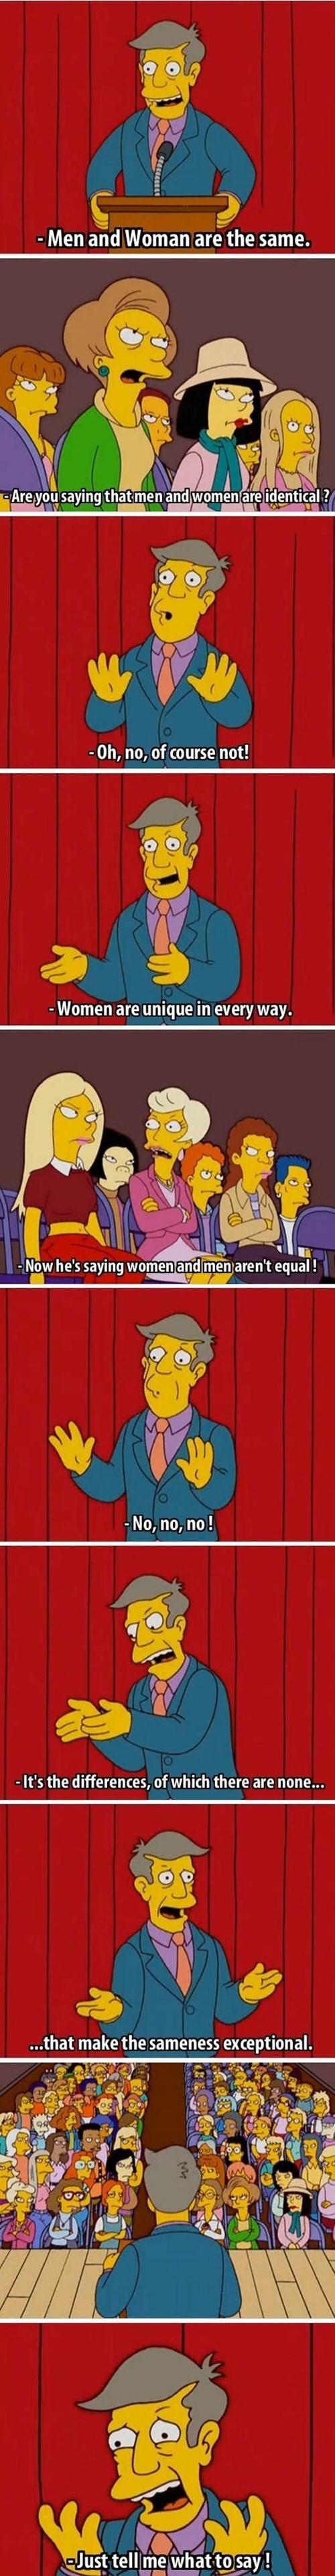 skinner on equality